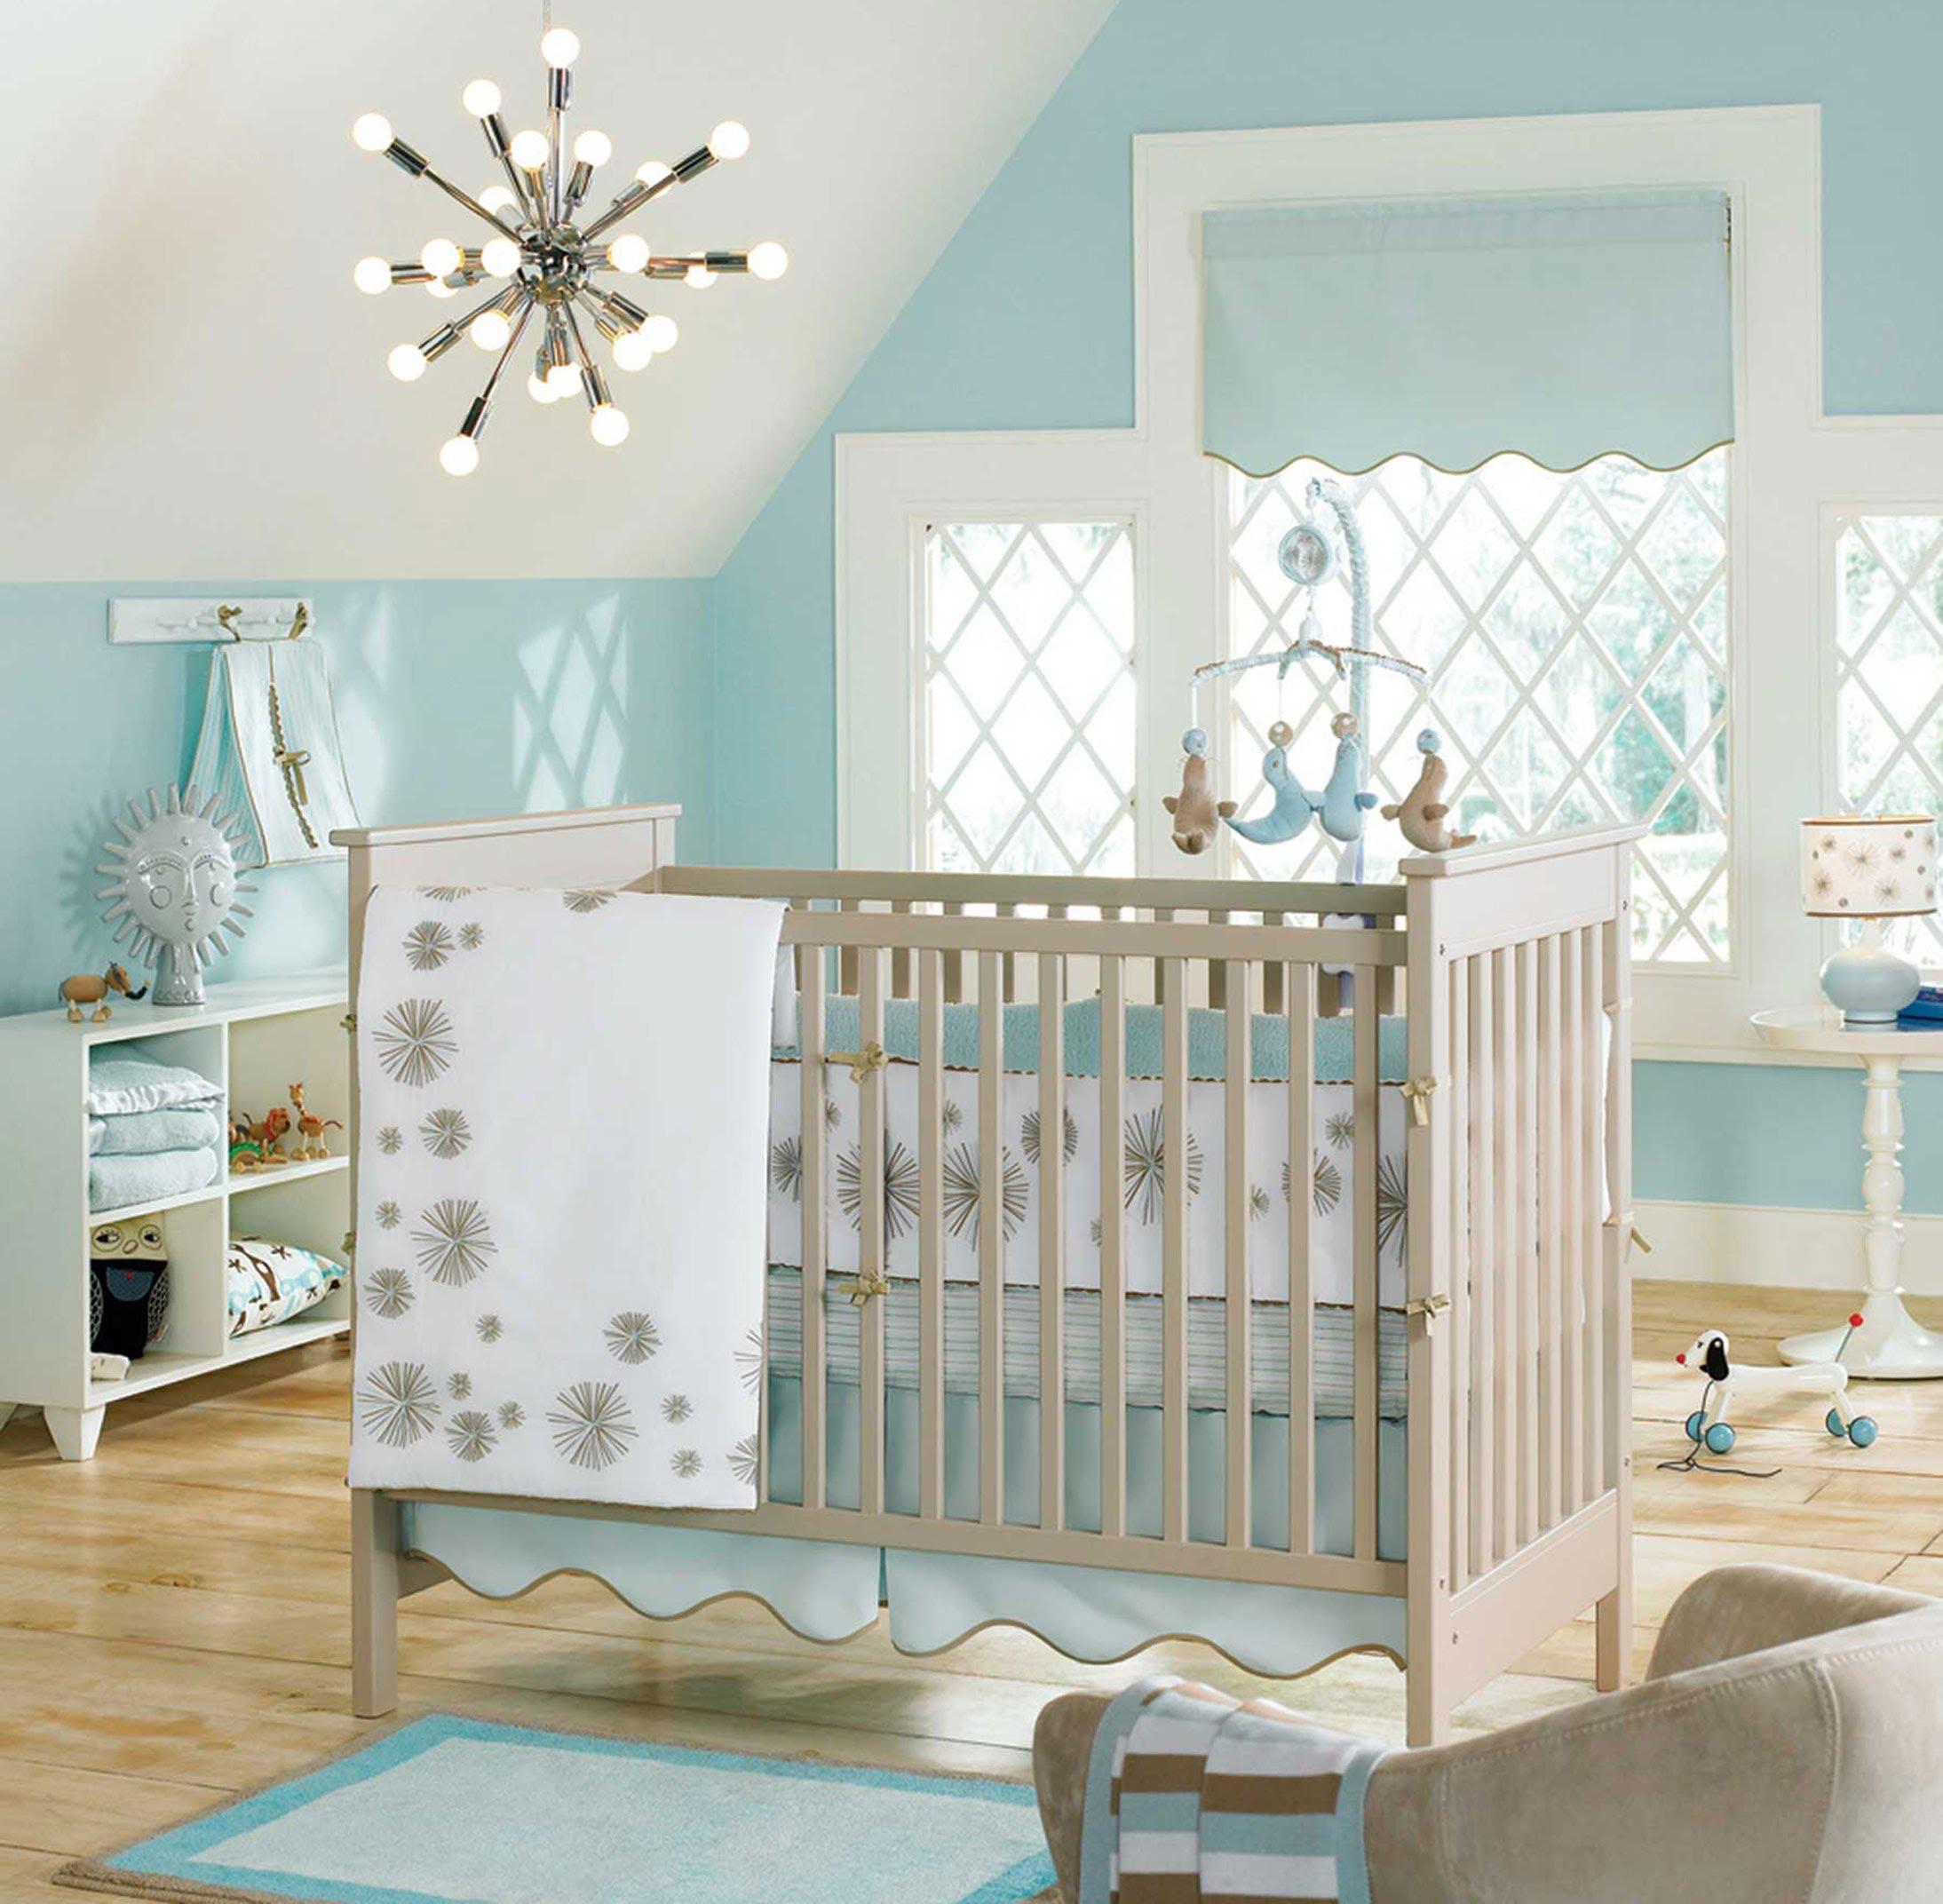 cool-unique-baby-girl-nursery-ideas-design-gallery.jpg